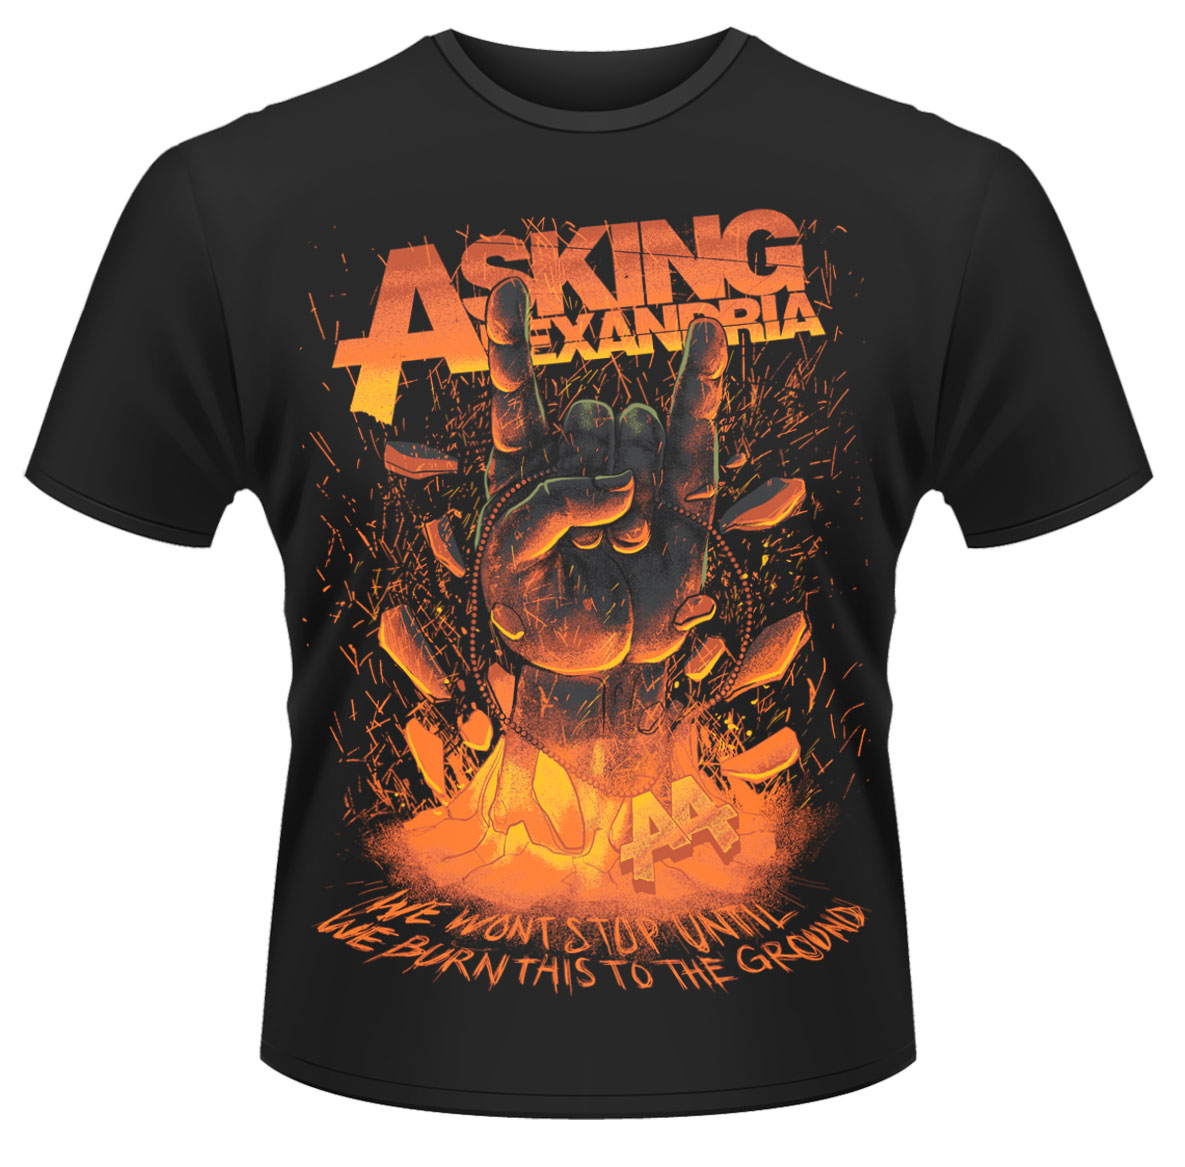 Asking-Alexandria-Metal-Hands-T-Shirt-NEW-OFFICIAL